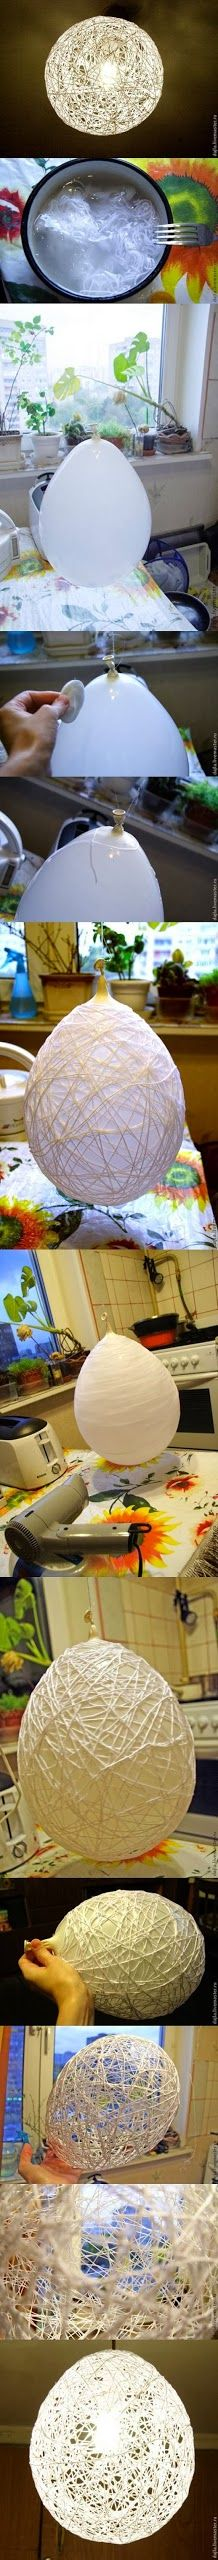 DIY : Yarn Made Chandelier